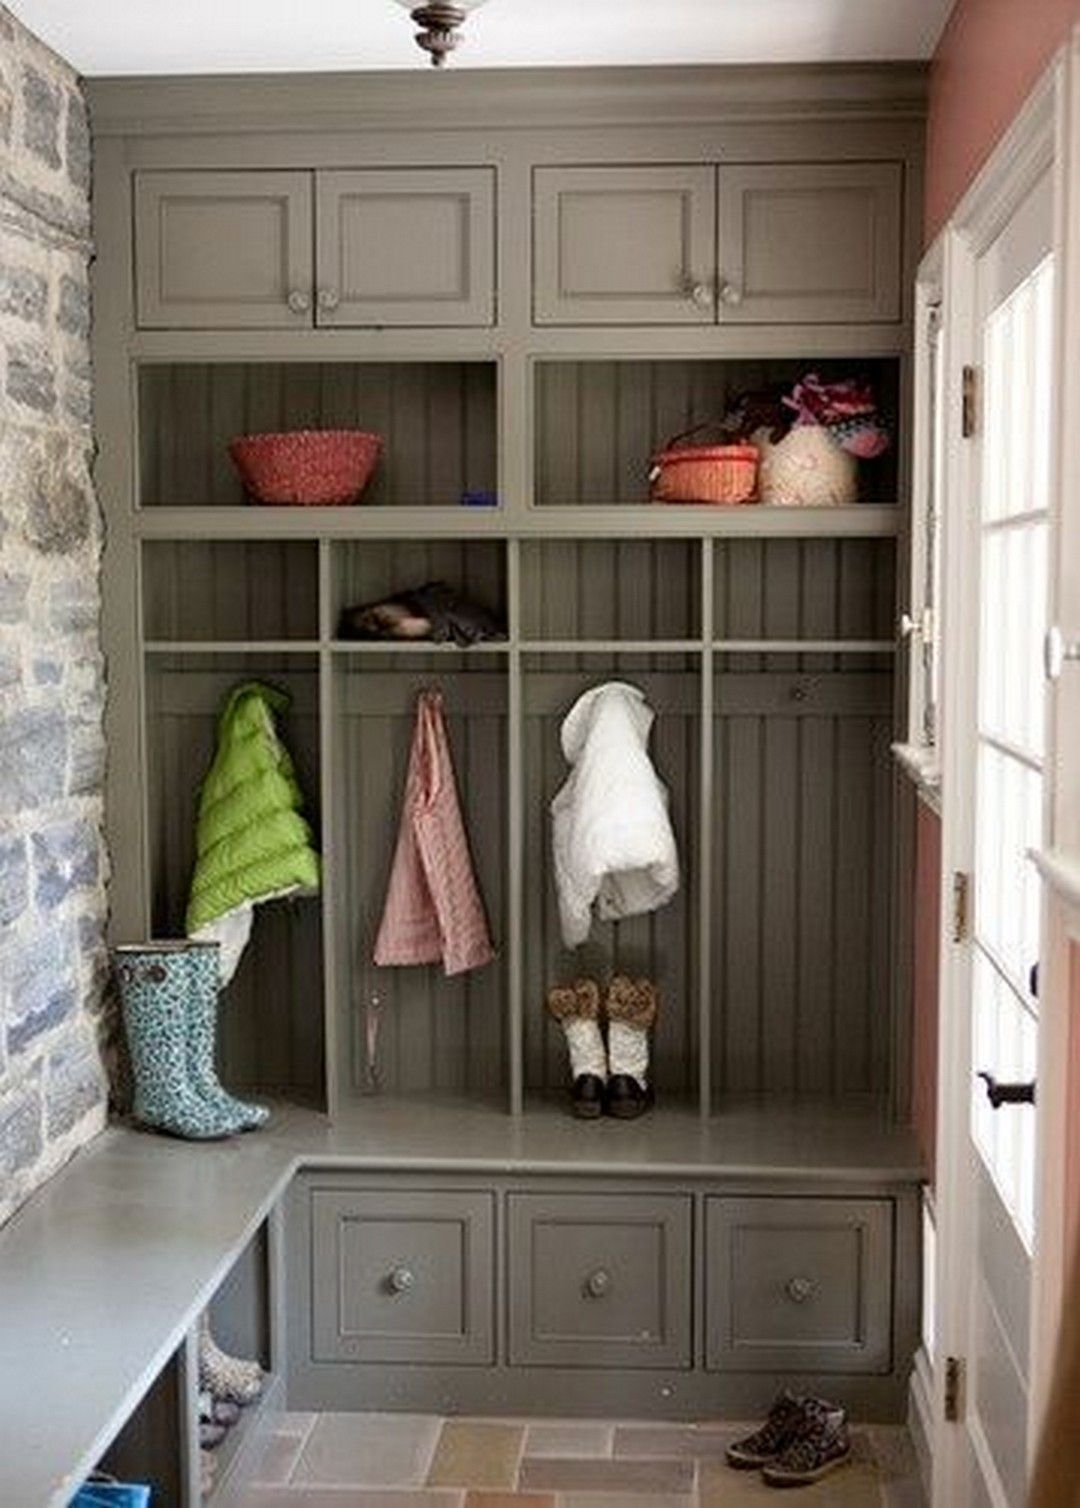 55 Utility Sink Renovation For Mudroom Farmhouse Room In 2020 Home Mudroom Design Mudroom Lockers